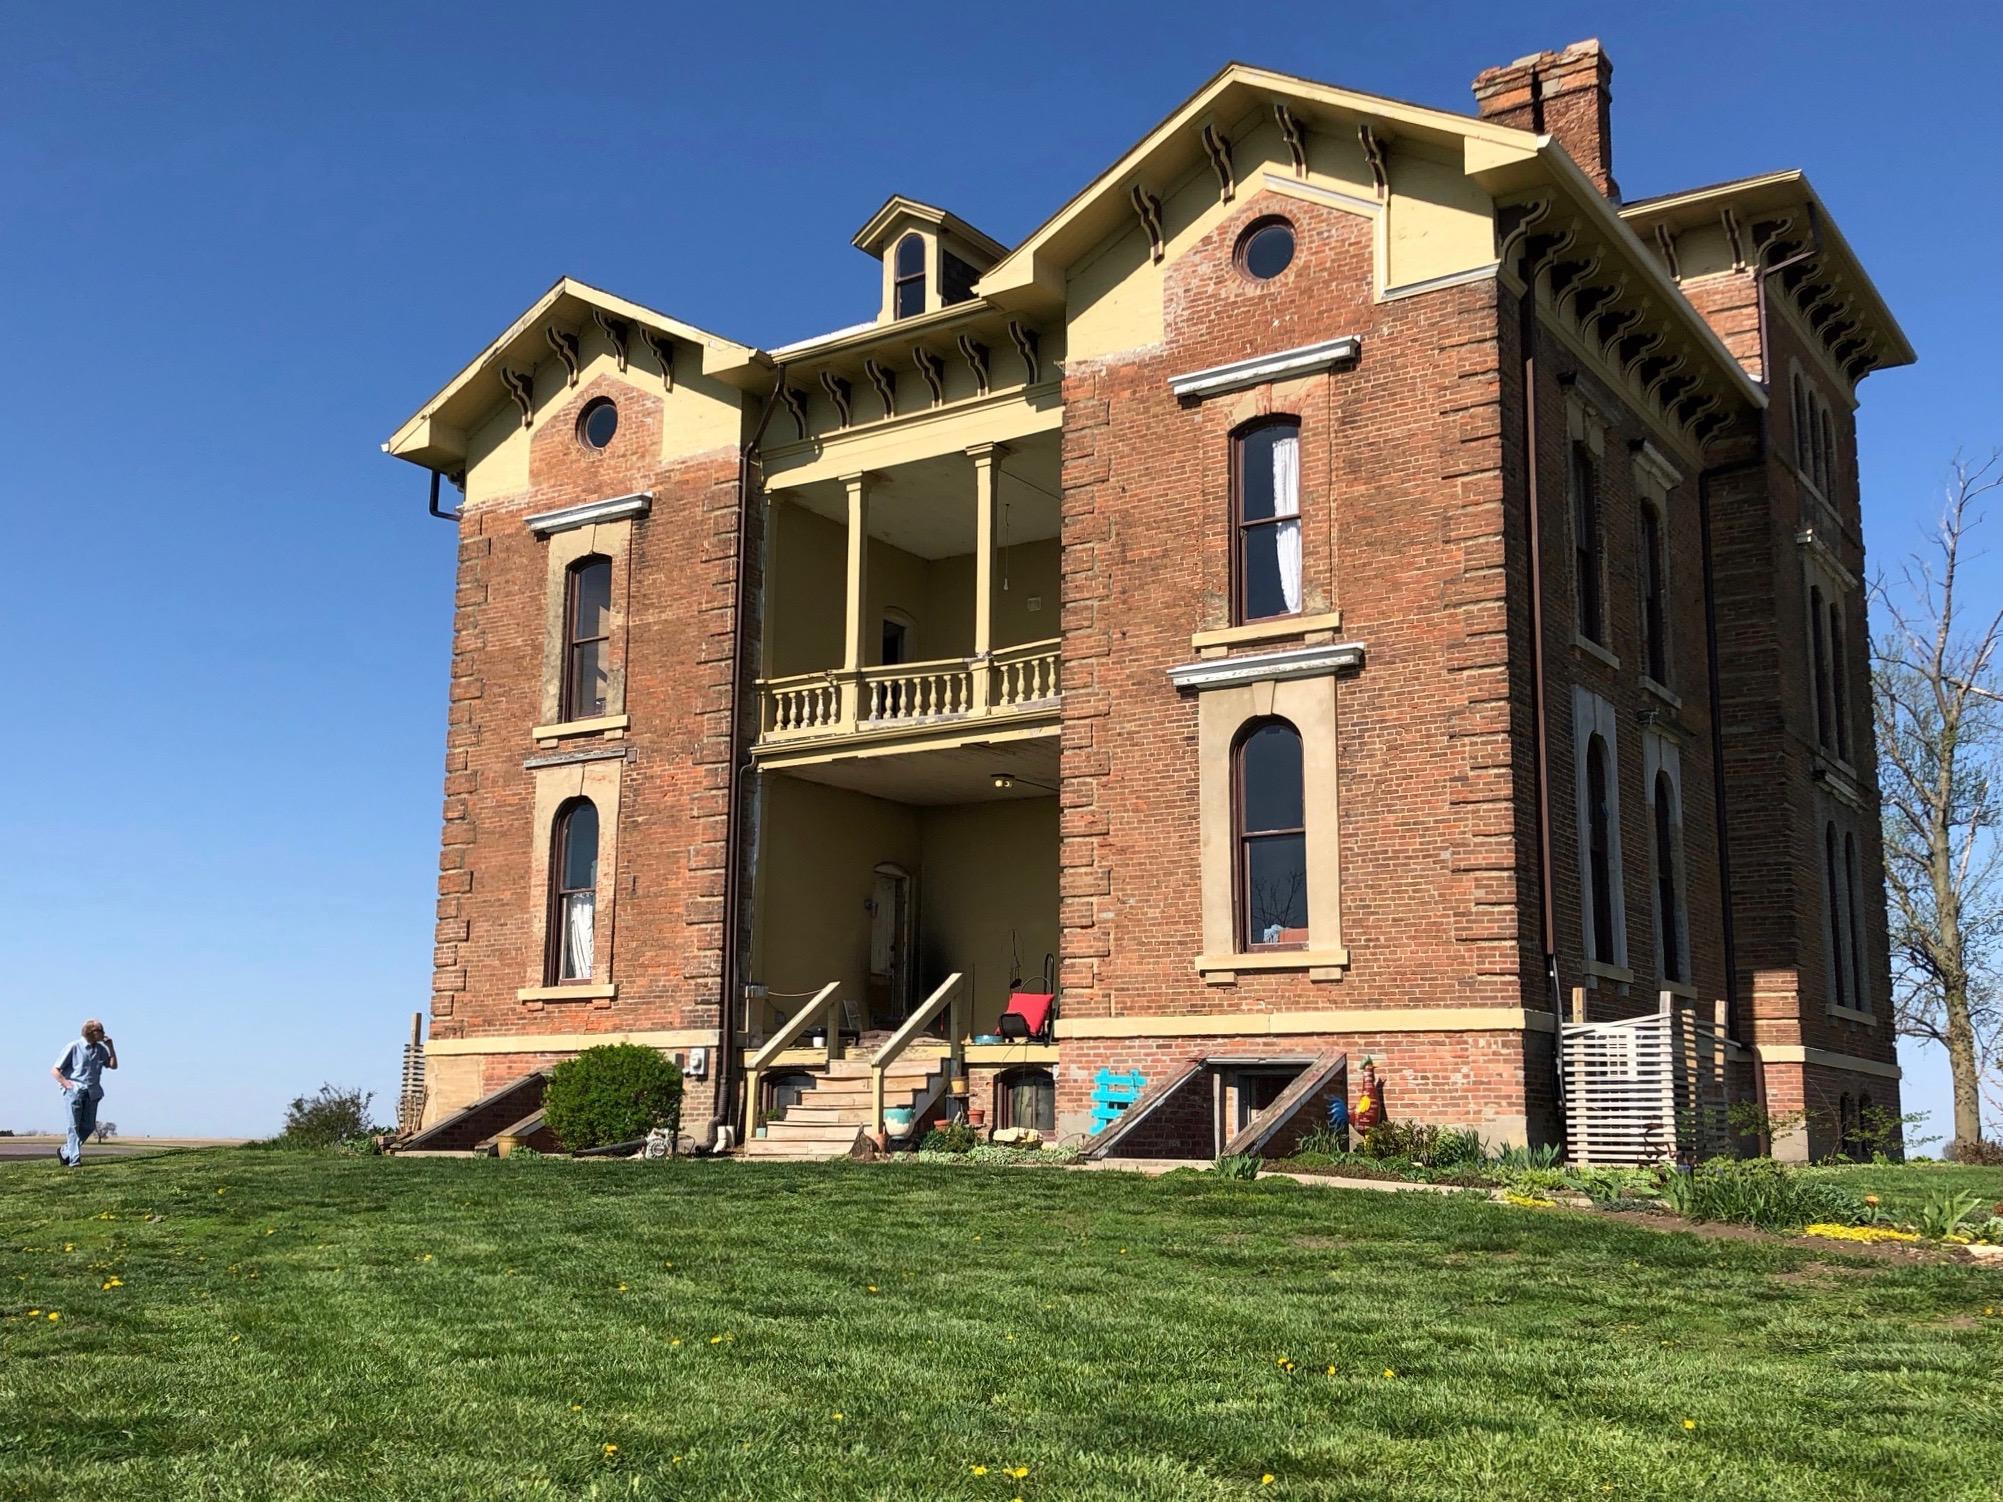 Duncan Manor in Towanda (One Illinois/Ted Cox)